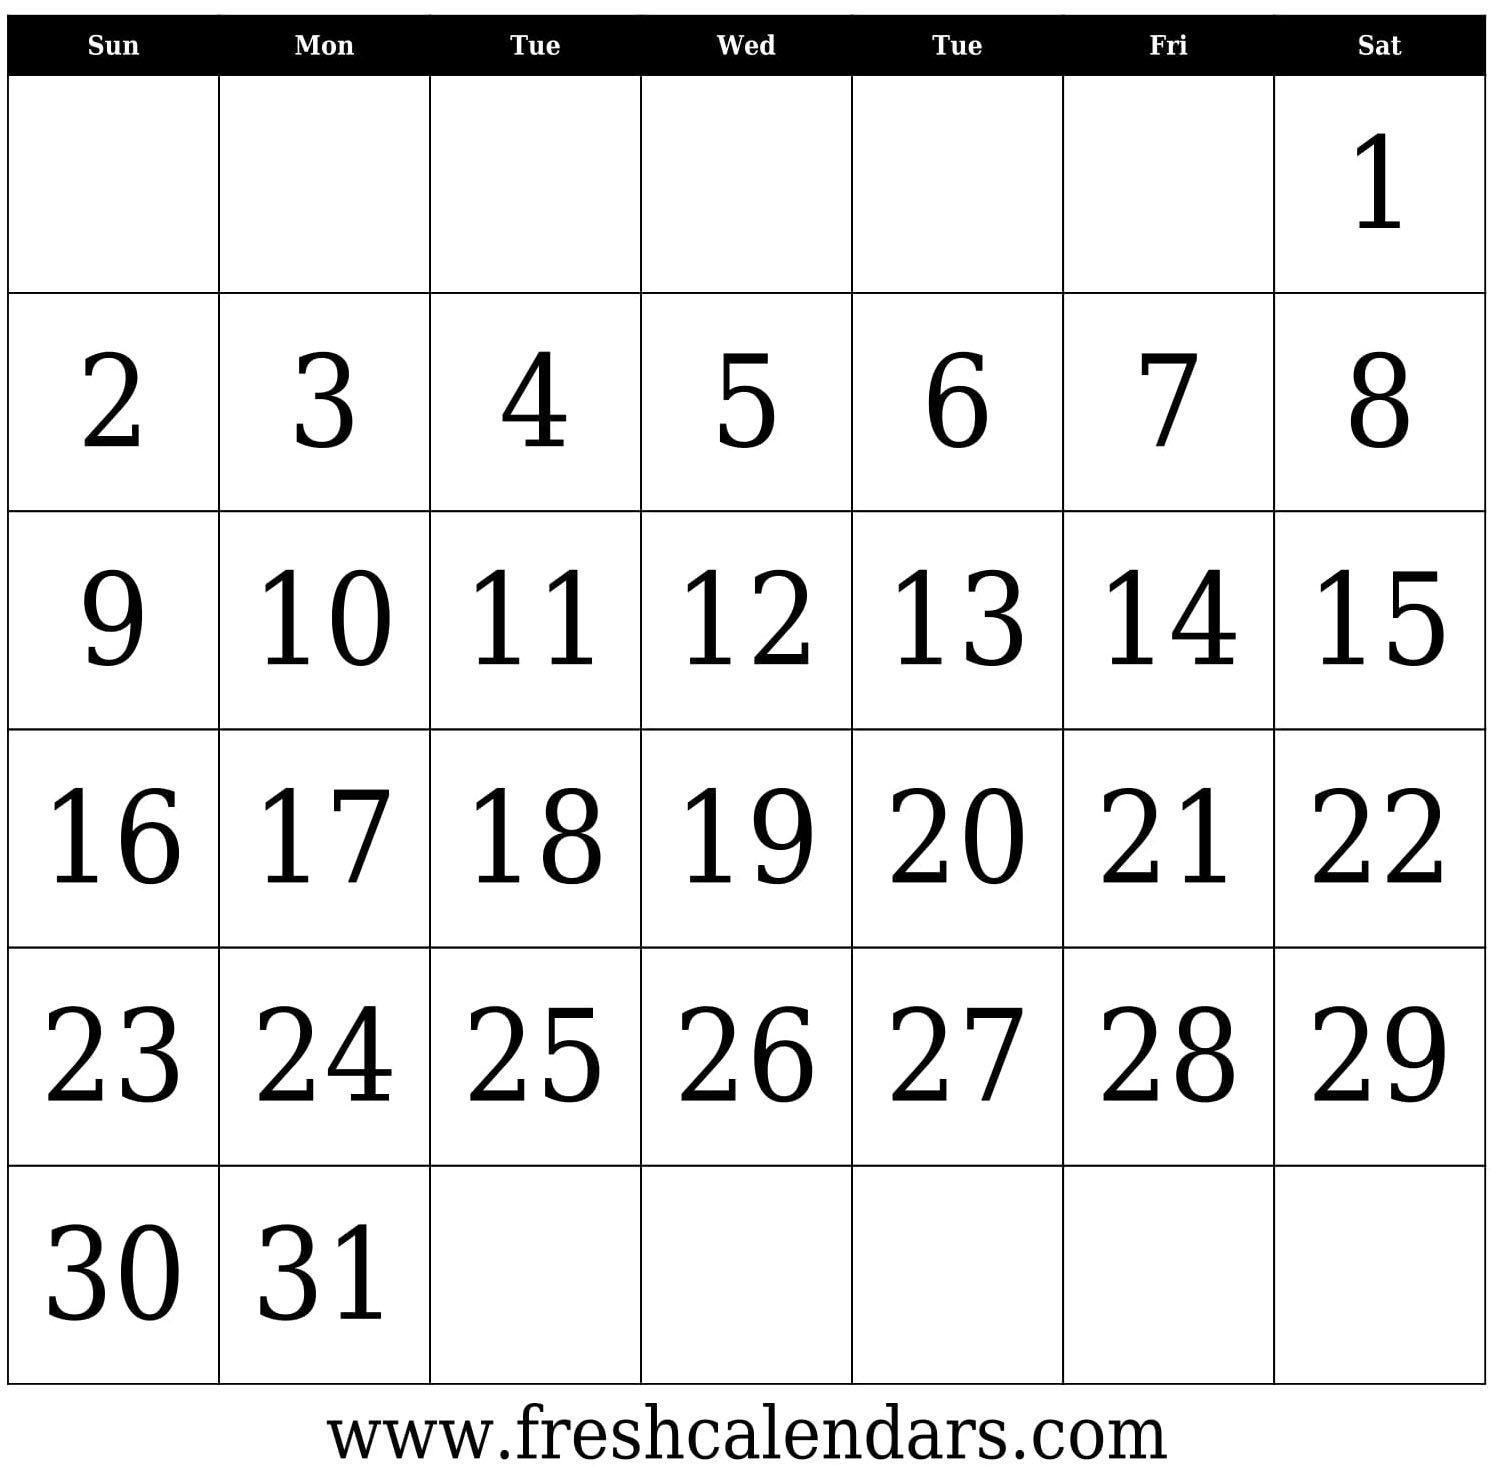 The 31 Day Calendar Printable | Printable Blank Calendar